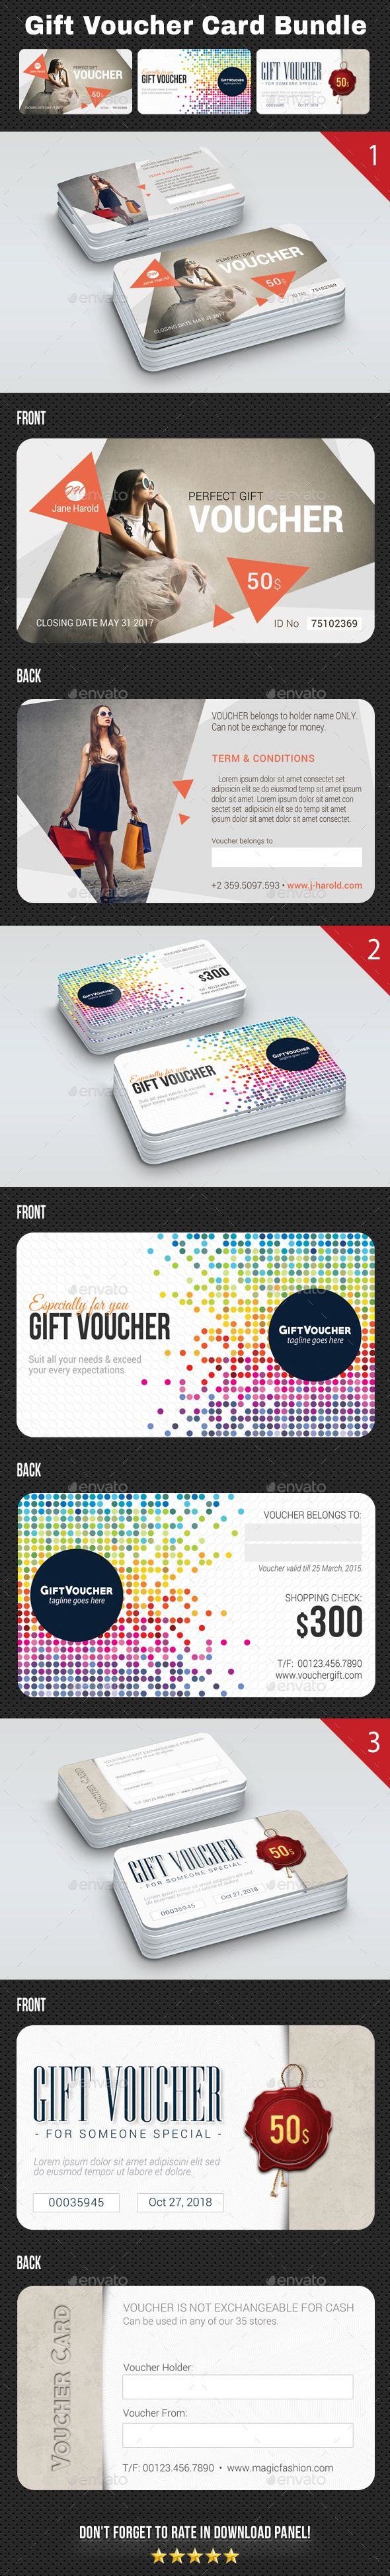 Best 25 Gift voucher design ideas on Pinterest